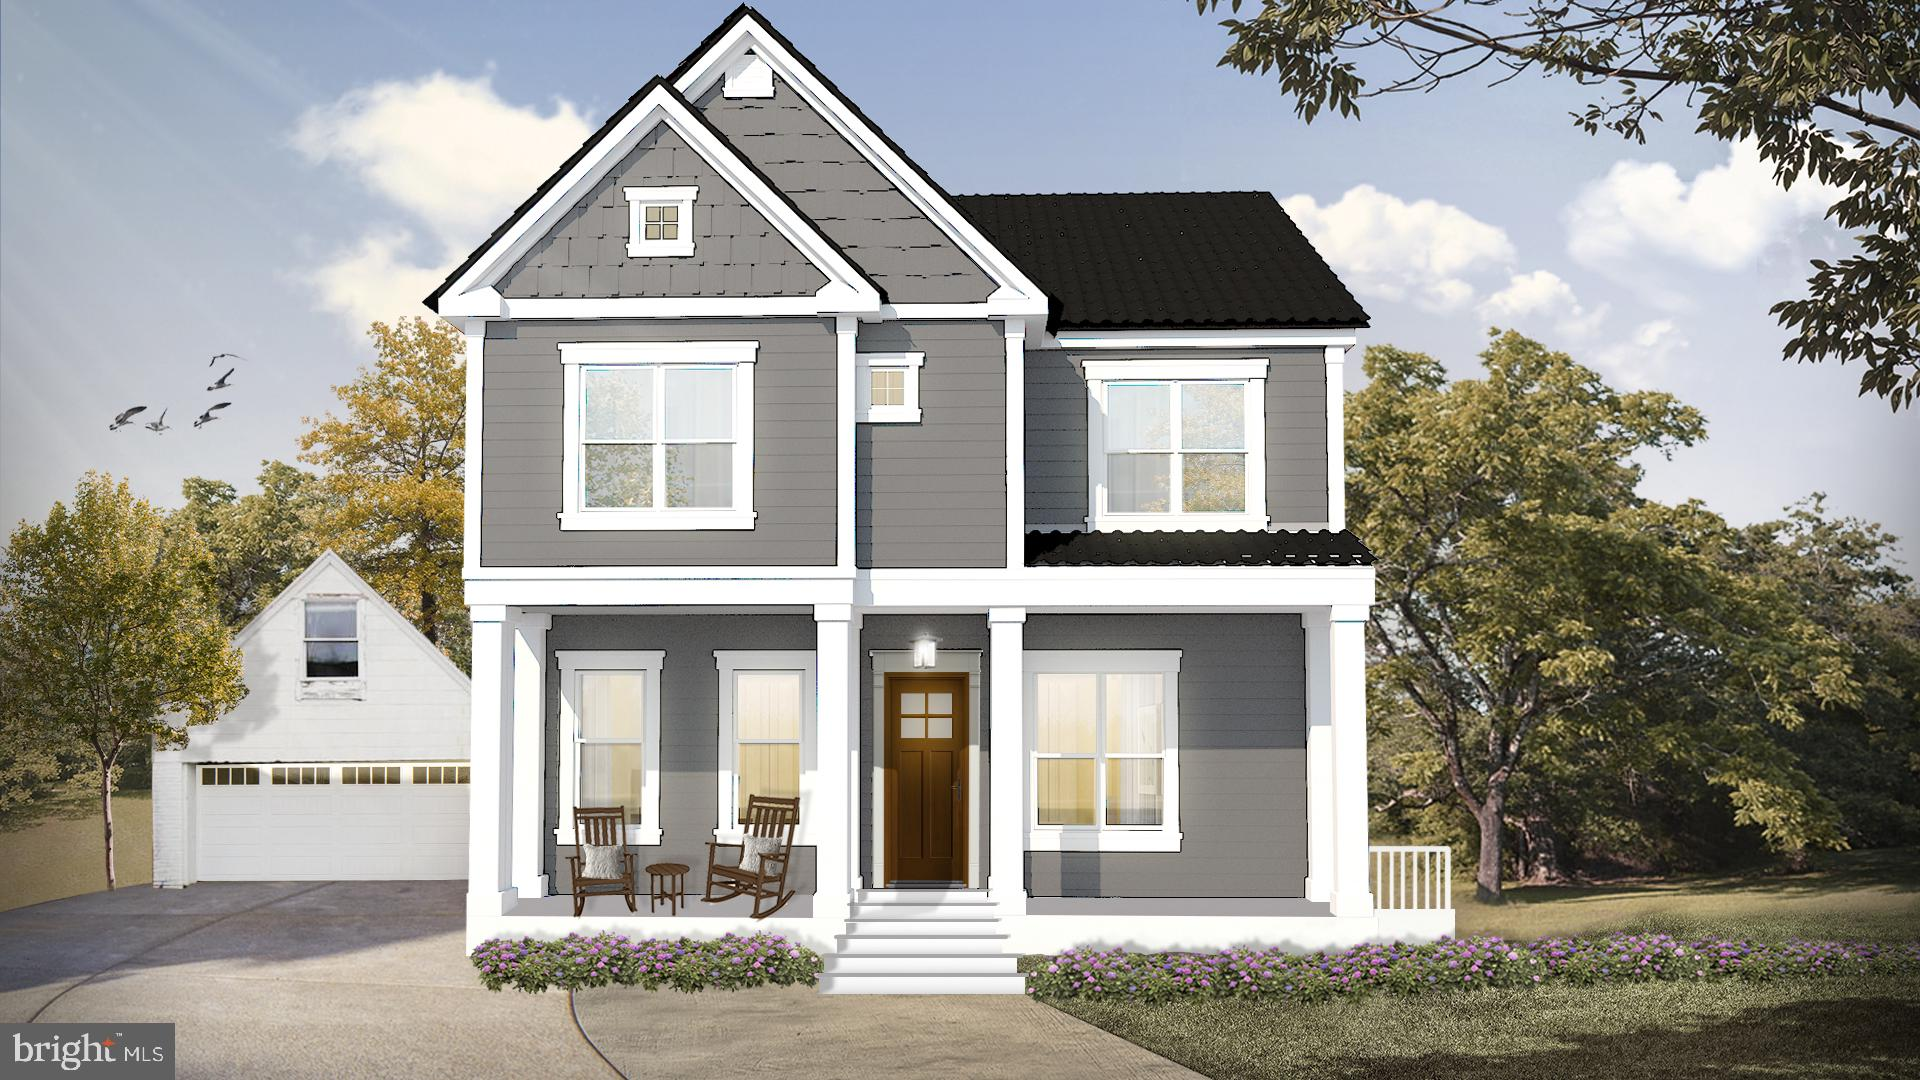 1723 S NELSON STREET, ARLINGTON, VA 22204